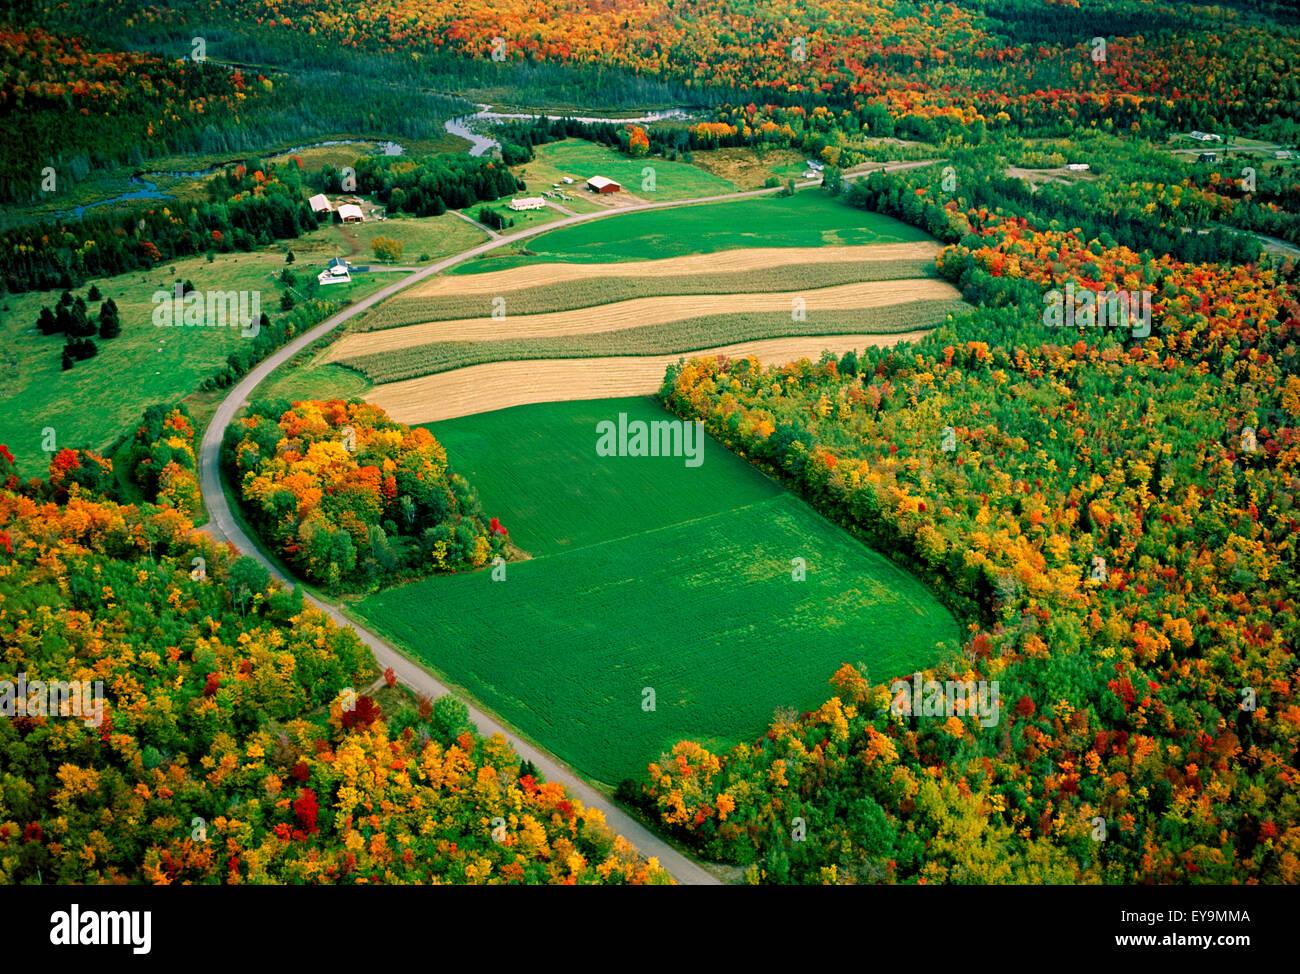 Maine,Scenic,Aerial View,aroostook county Stock Photo: 85651002 - Alamy